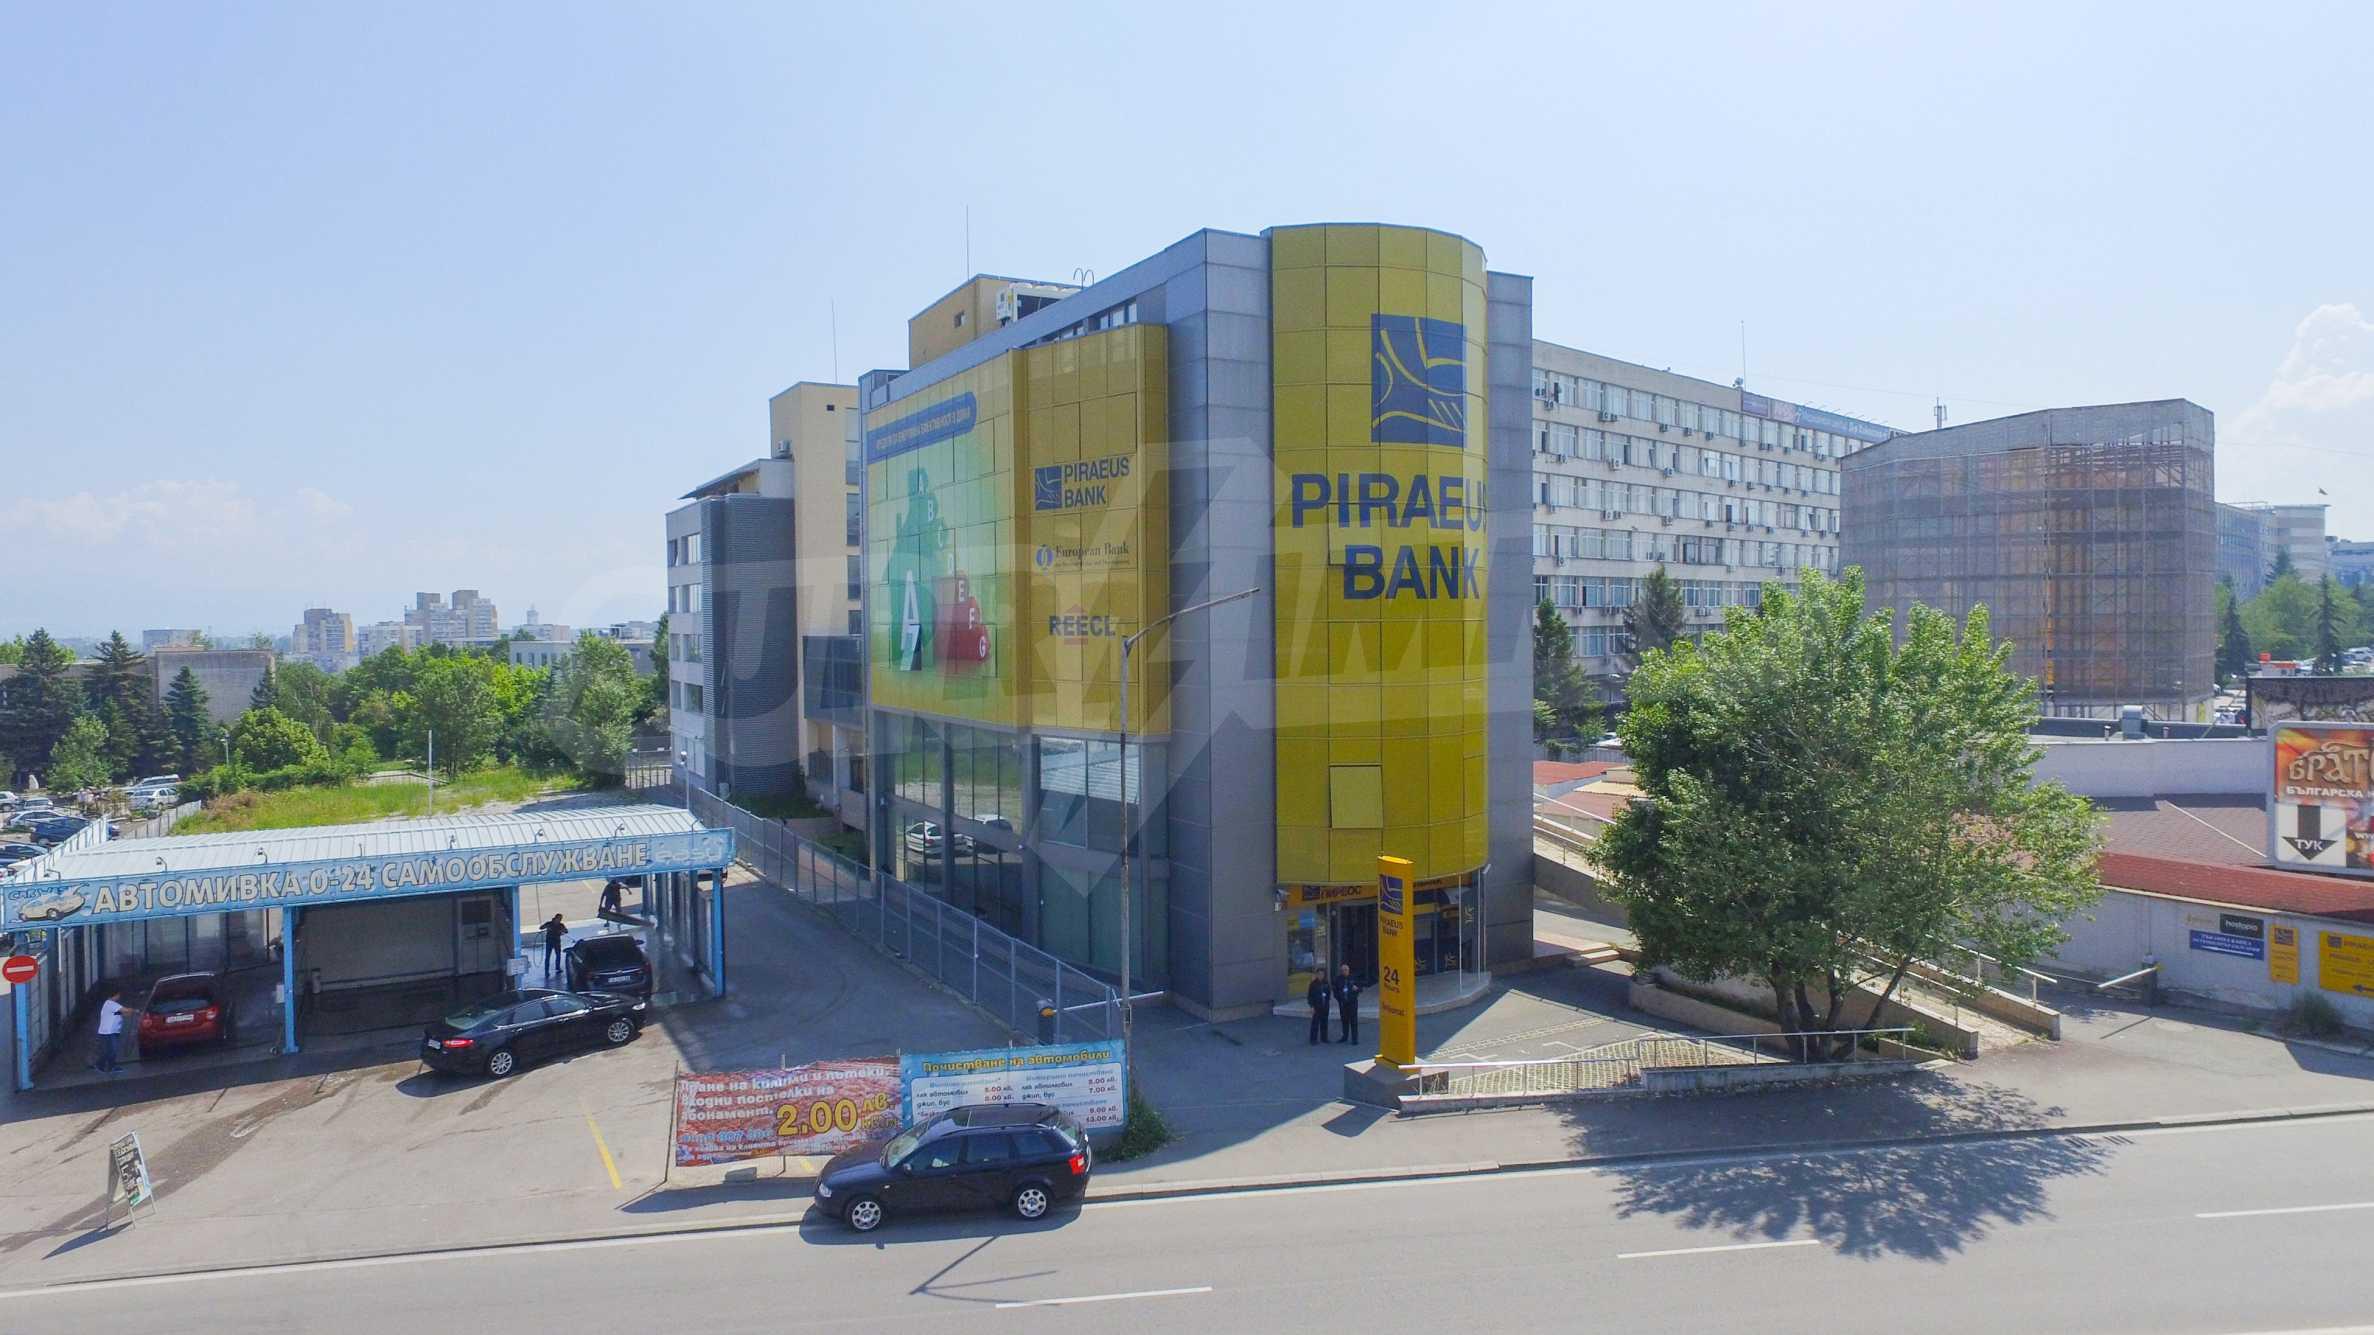 Офис в бизнес сграда висок клас на бул. Цариградско шосе 41